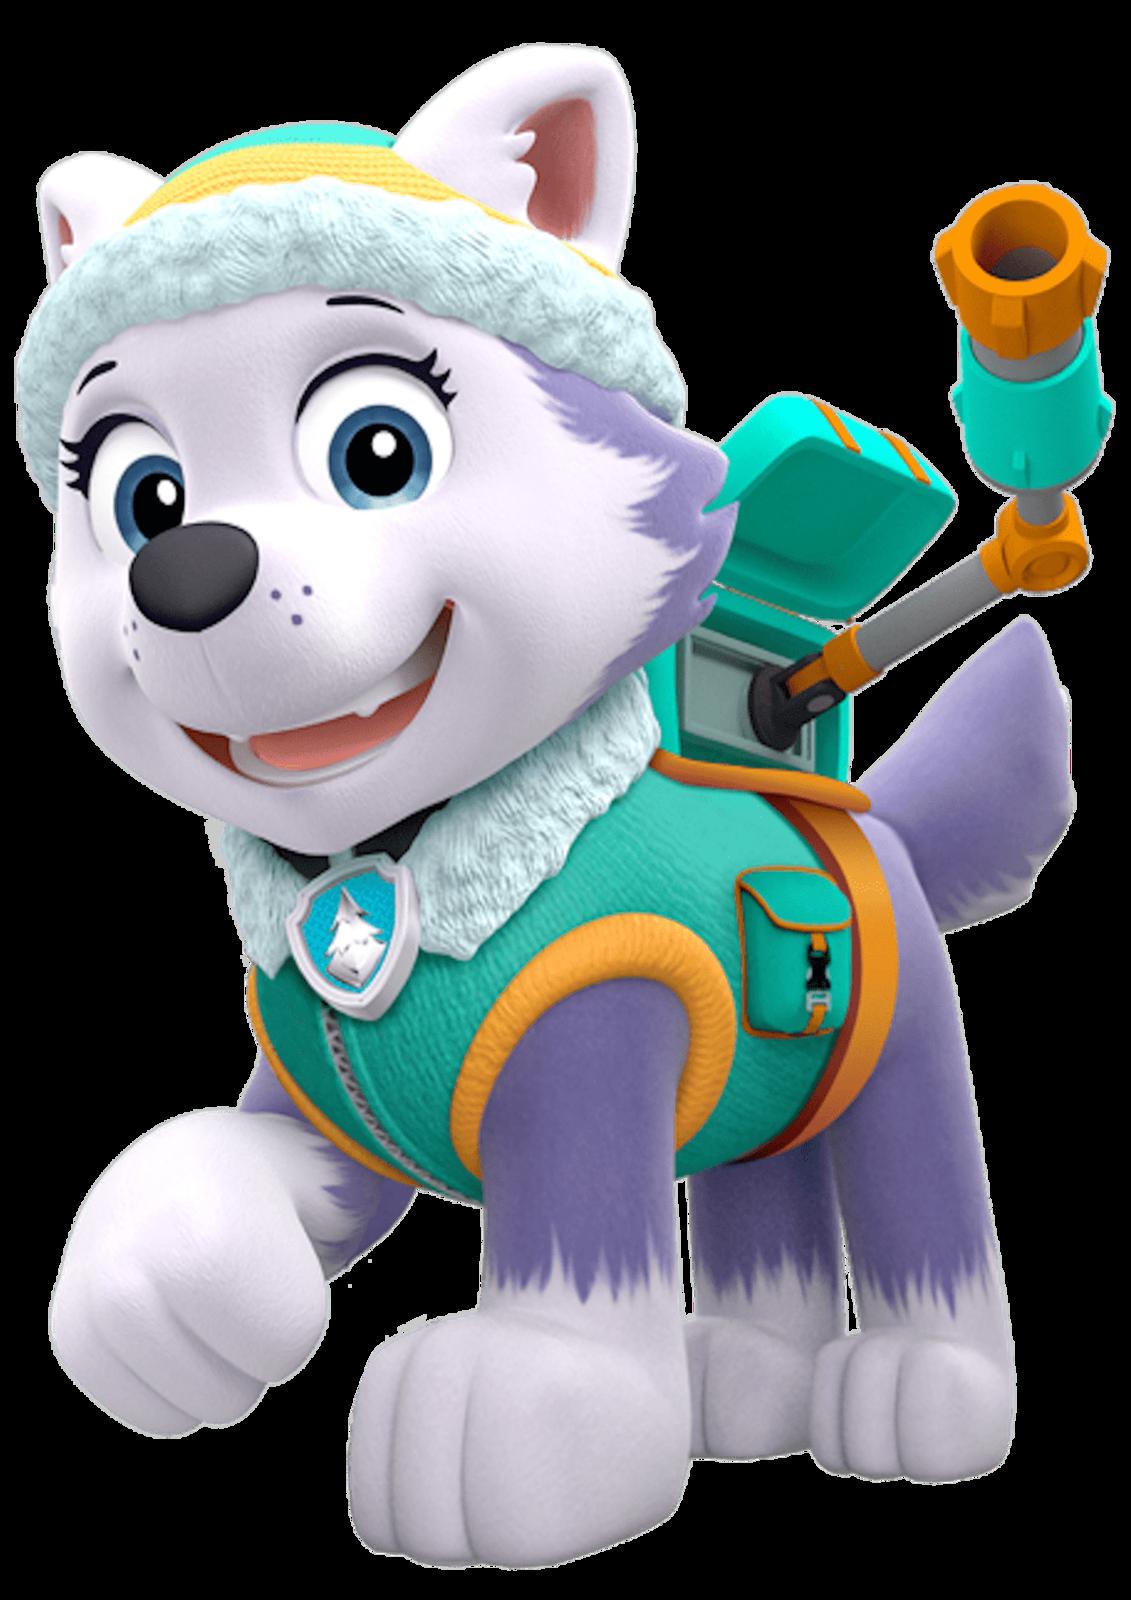 Paw patrol free clipart royalty free library Siberian Husky Super Paw Patrol Adventure Puppy Party - paw patrol ... royalty free library